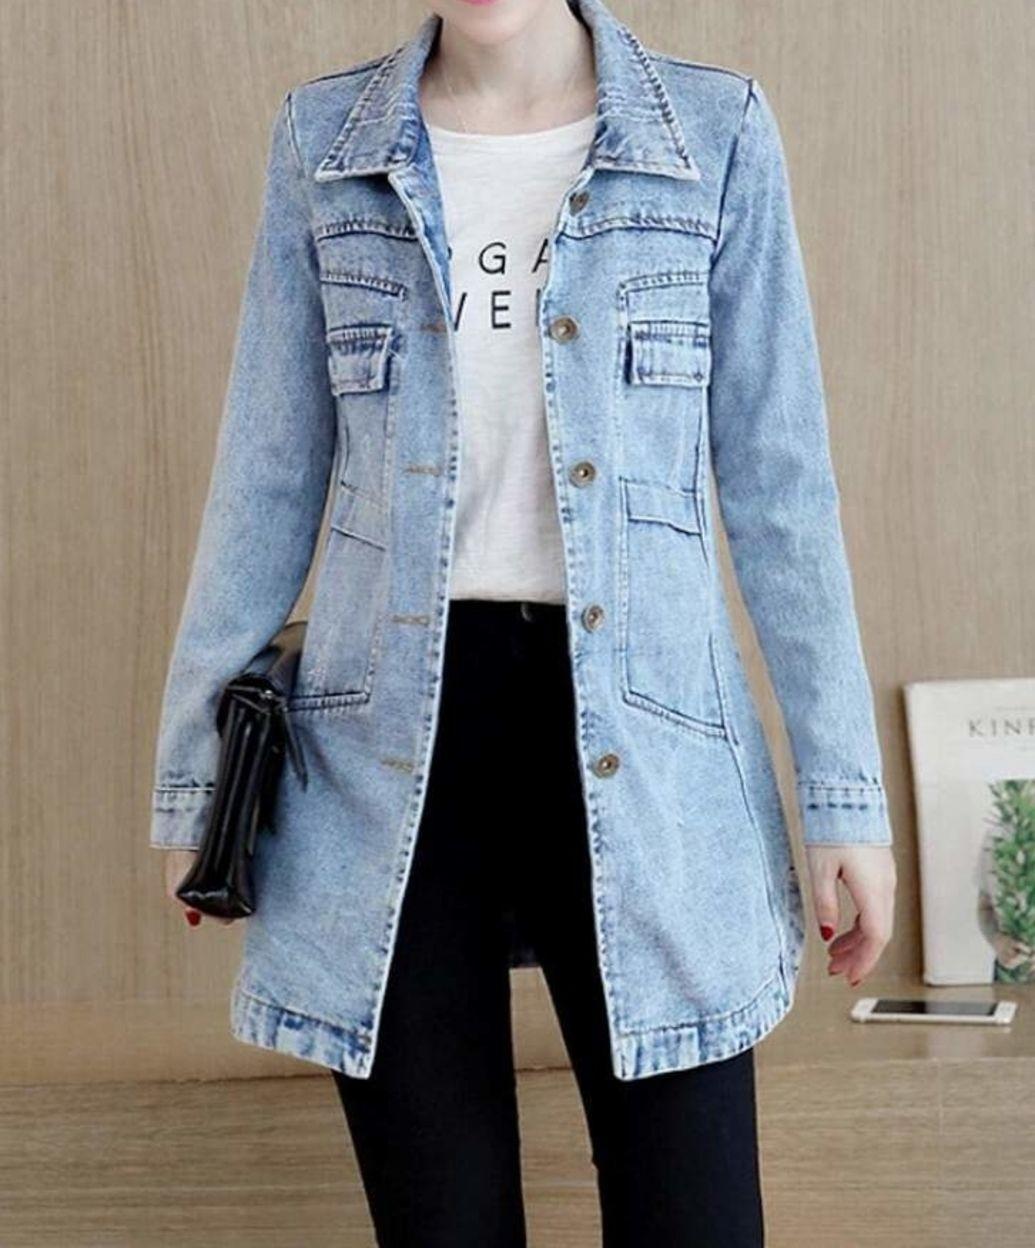 Womens Longer Length Denim Jacket In 2021 Long Denim Jacket Denim Jacket Denim Jacket Women [ 1248 x 1035 Pixel ]